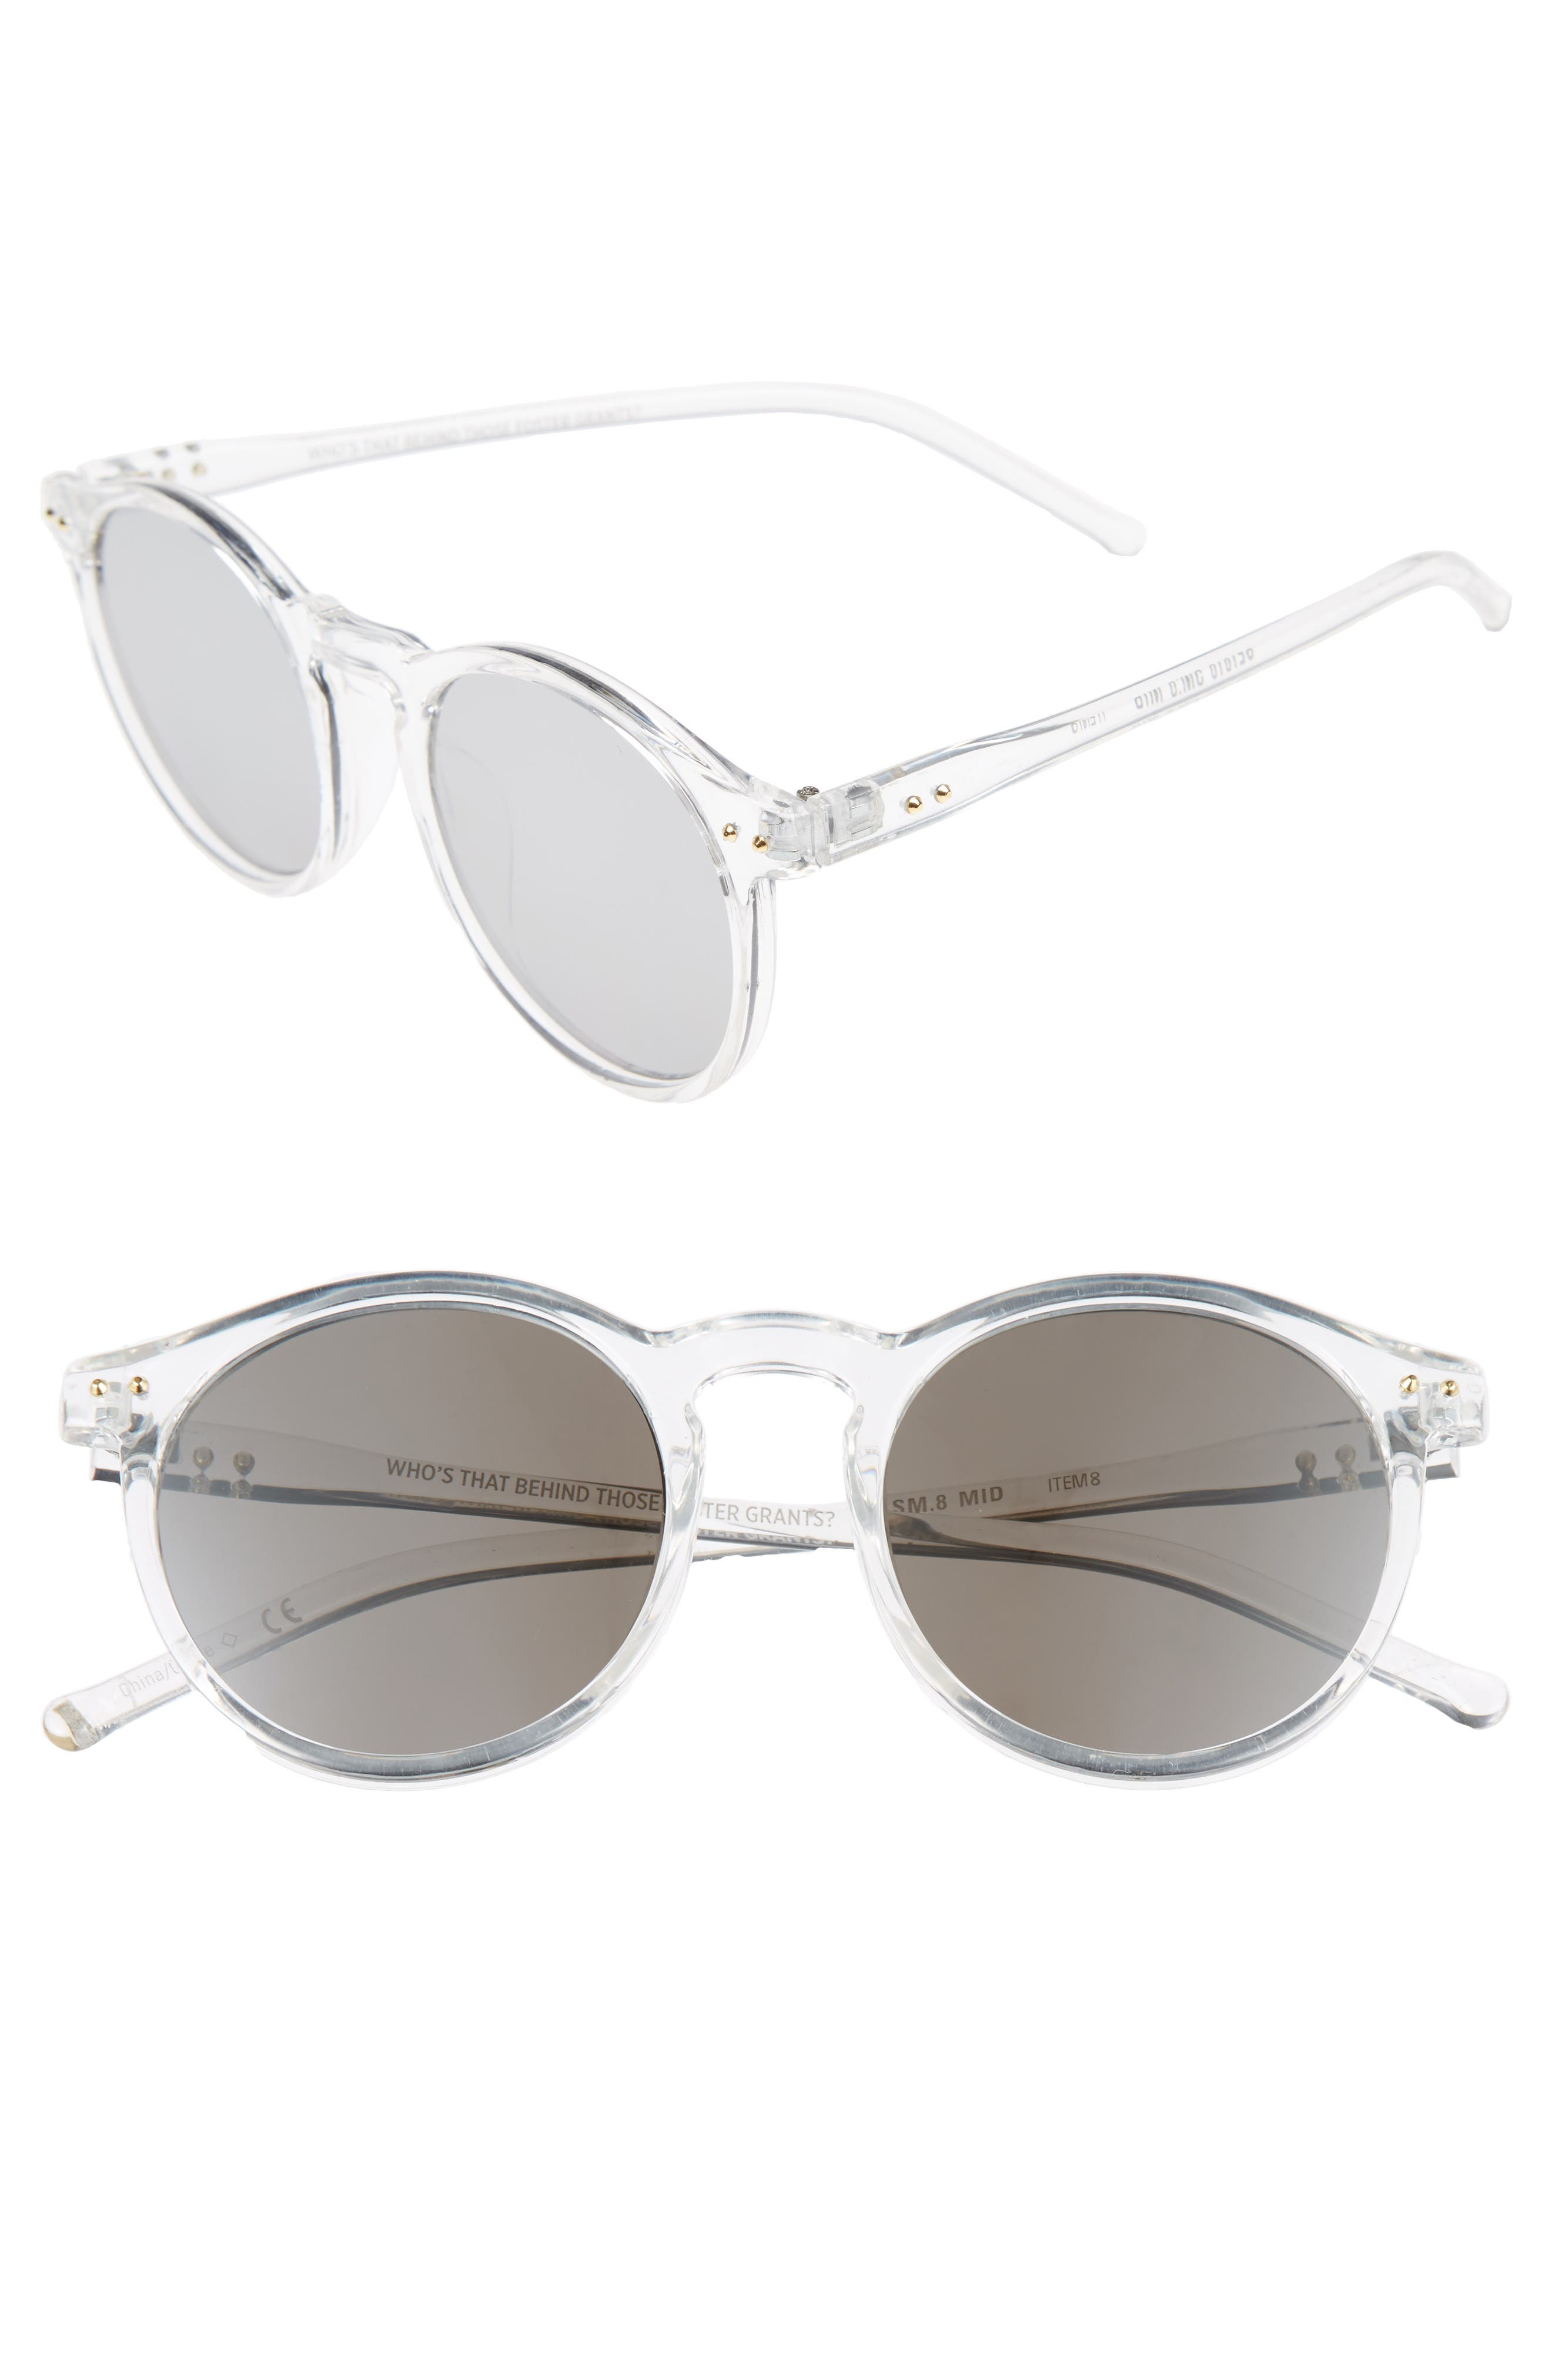 Alternate Image 1 Selected - Item 8 SM.8 52mm Sunglasses